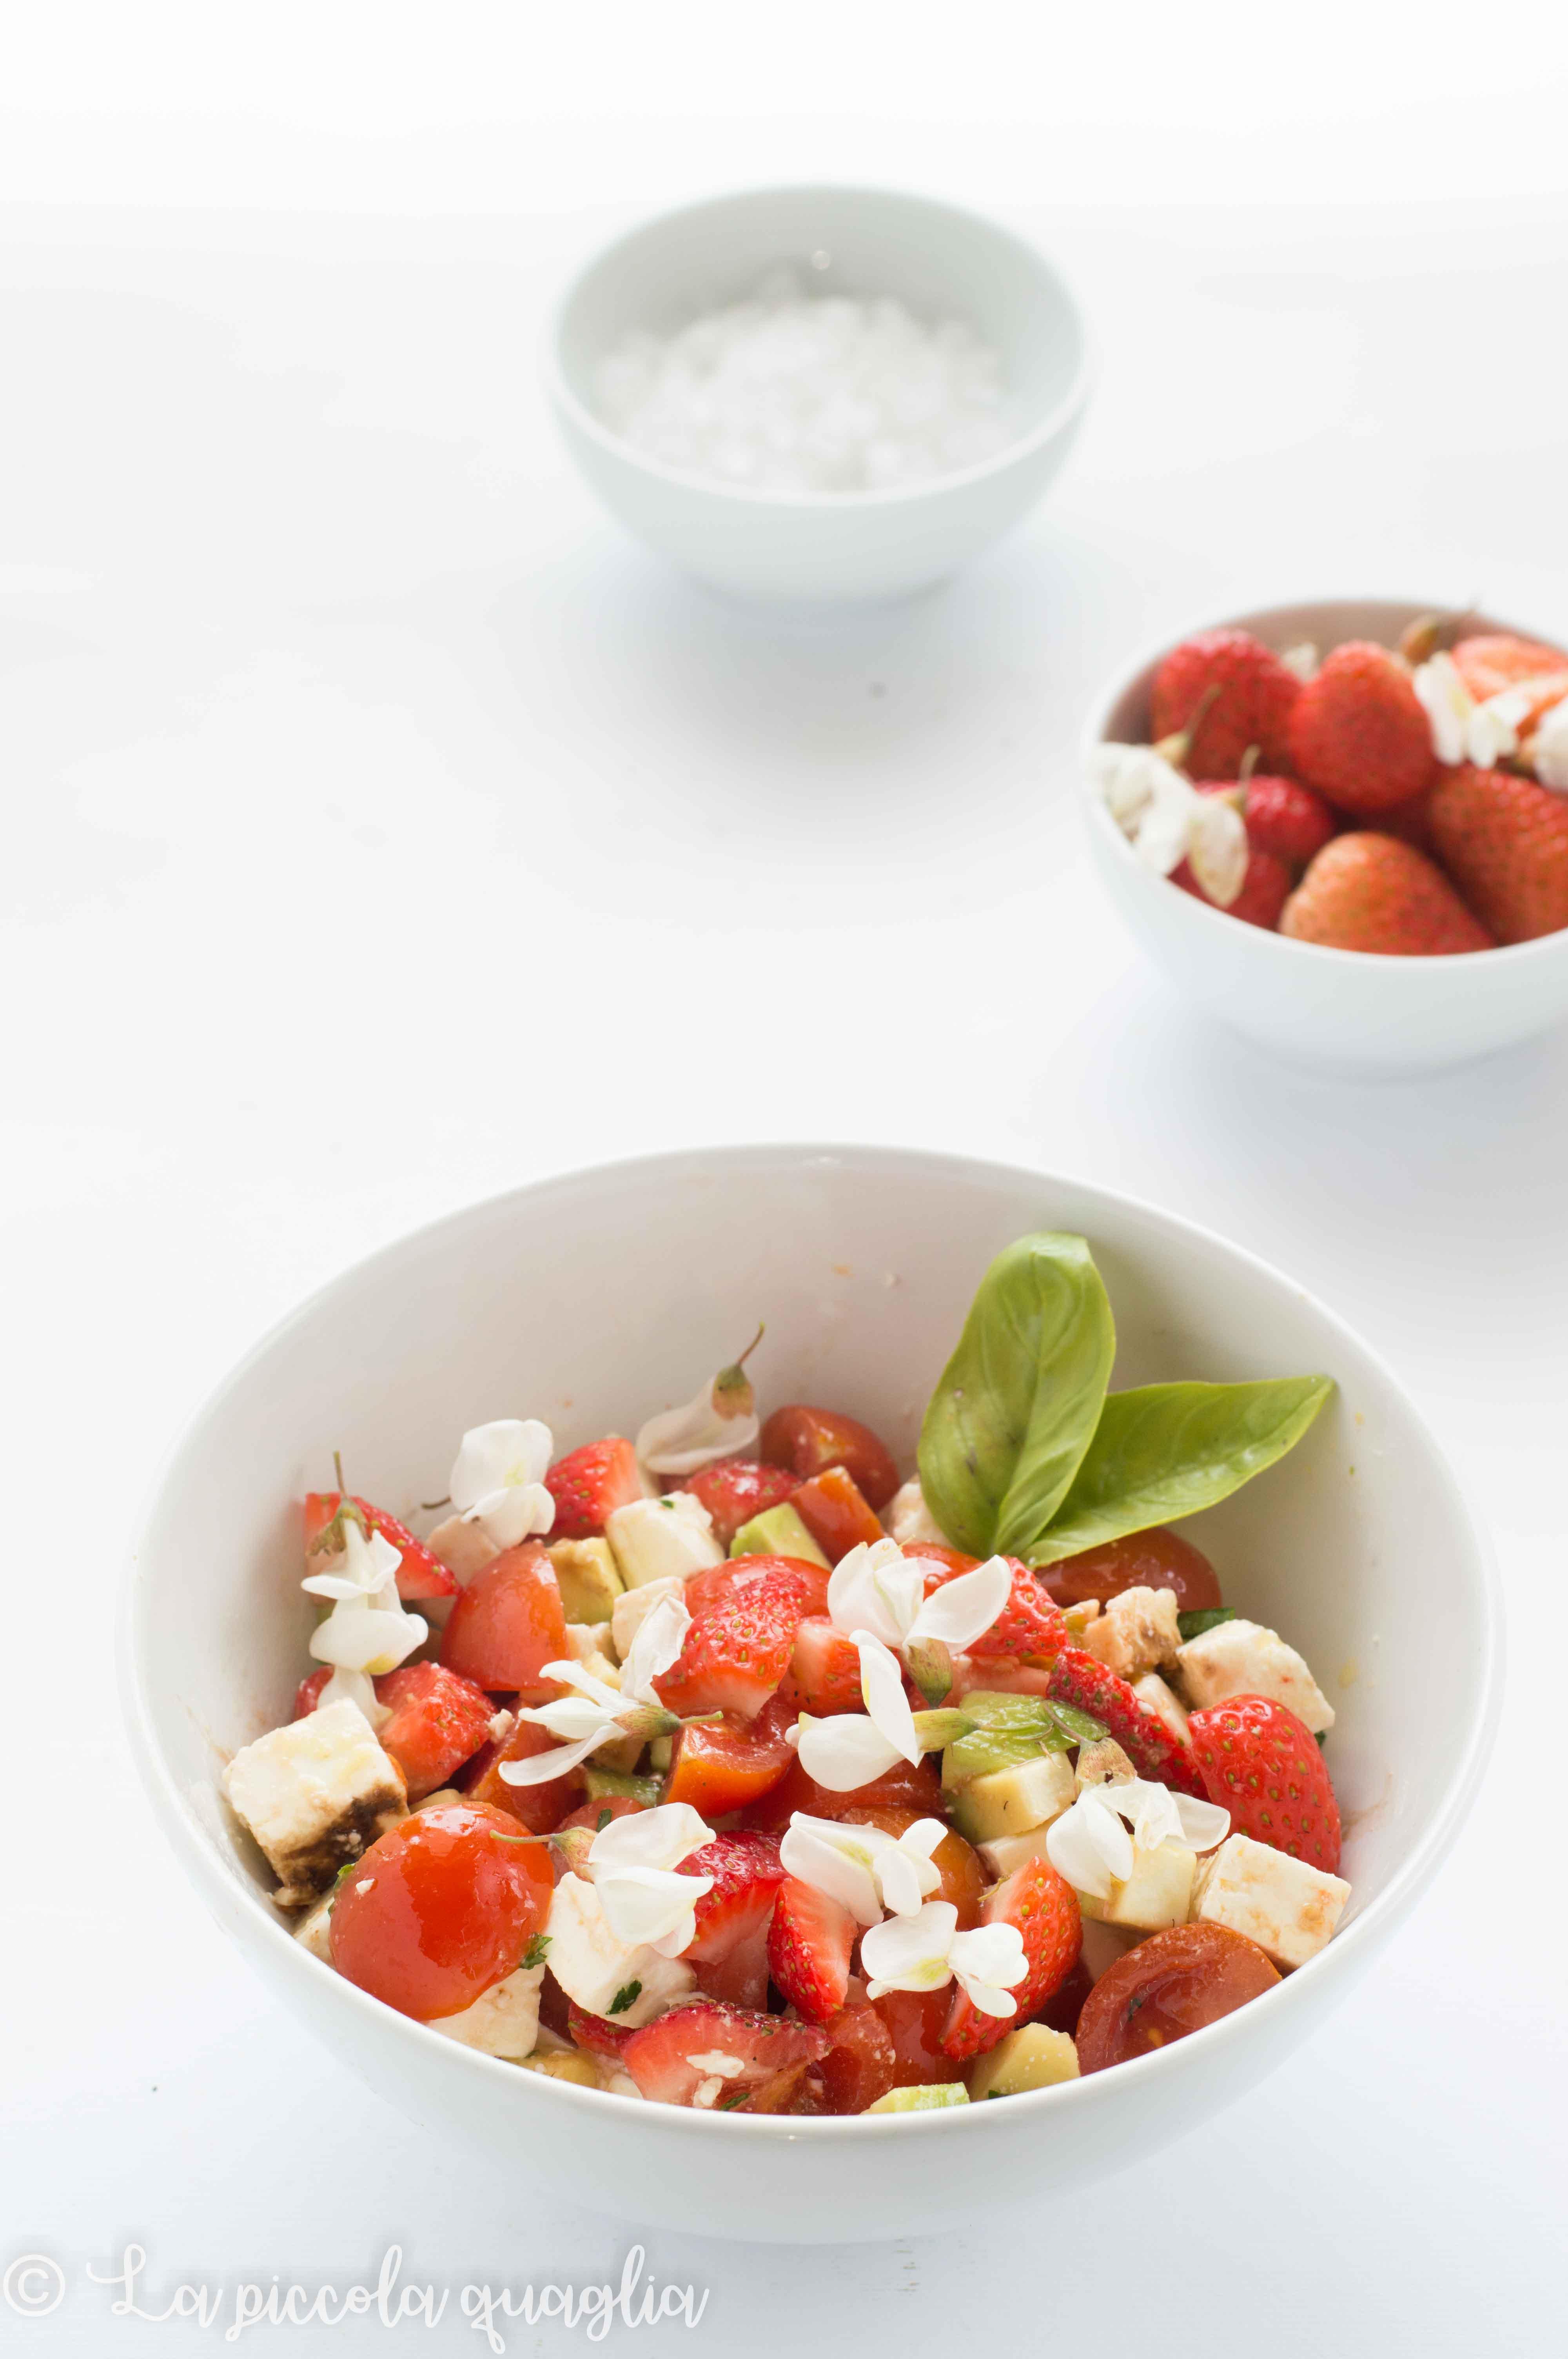 I sani venerdì: insalata di fragole